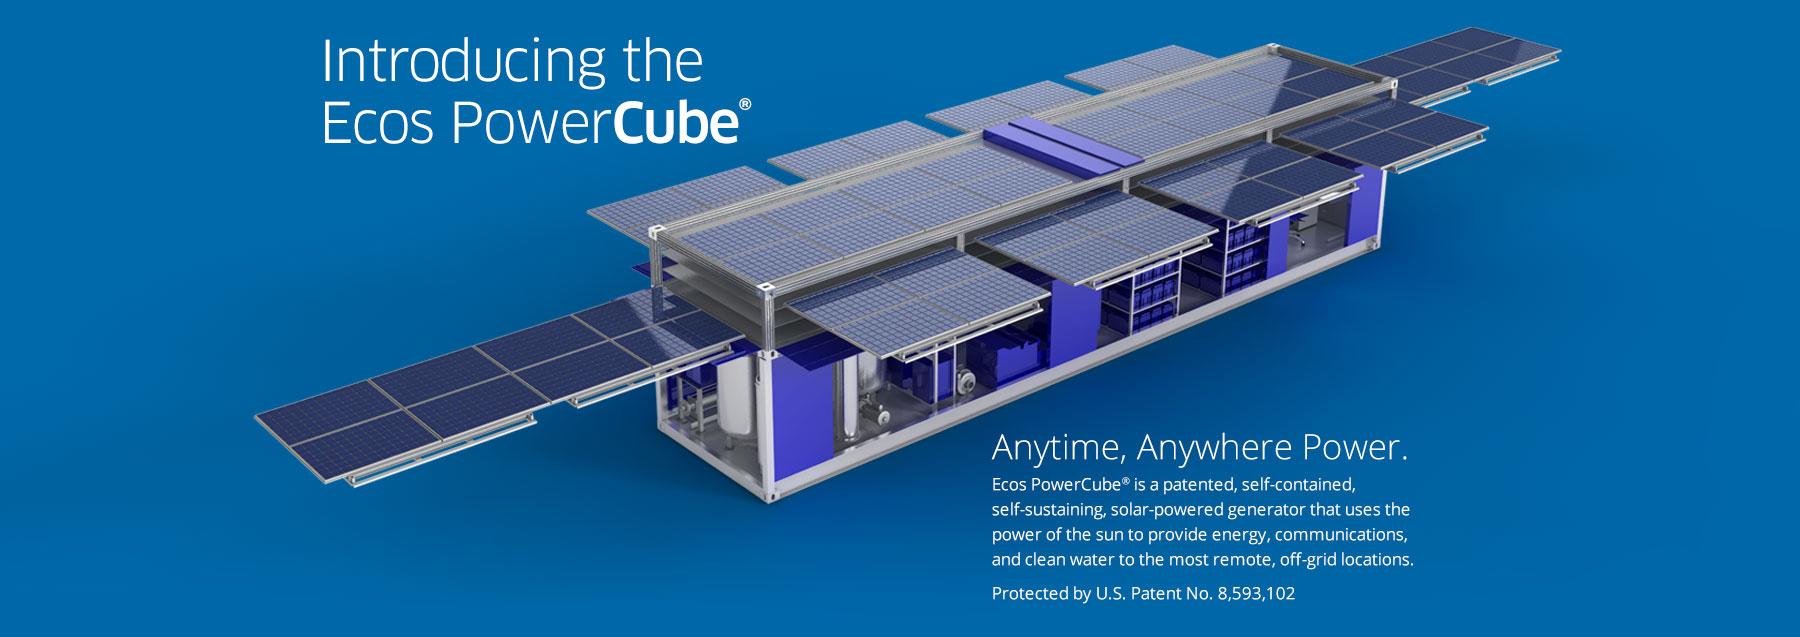 Ecos Powercube 174 World S Mobile Solar Powered Generator